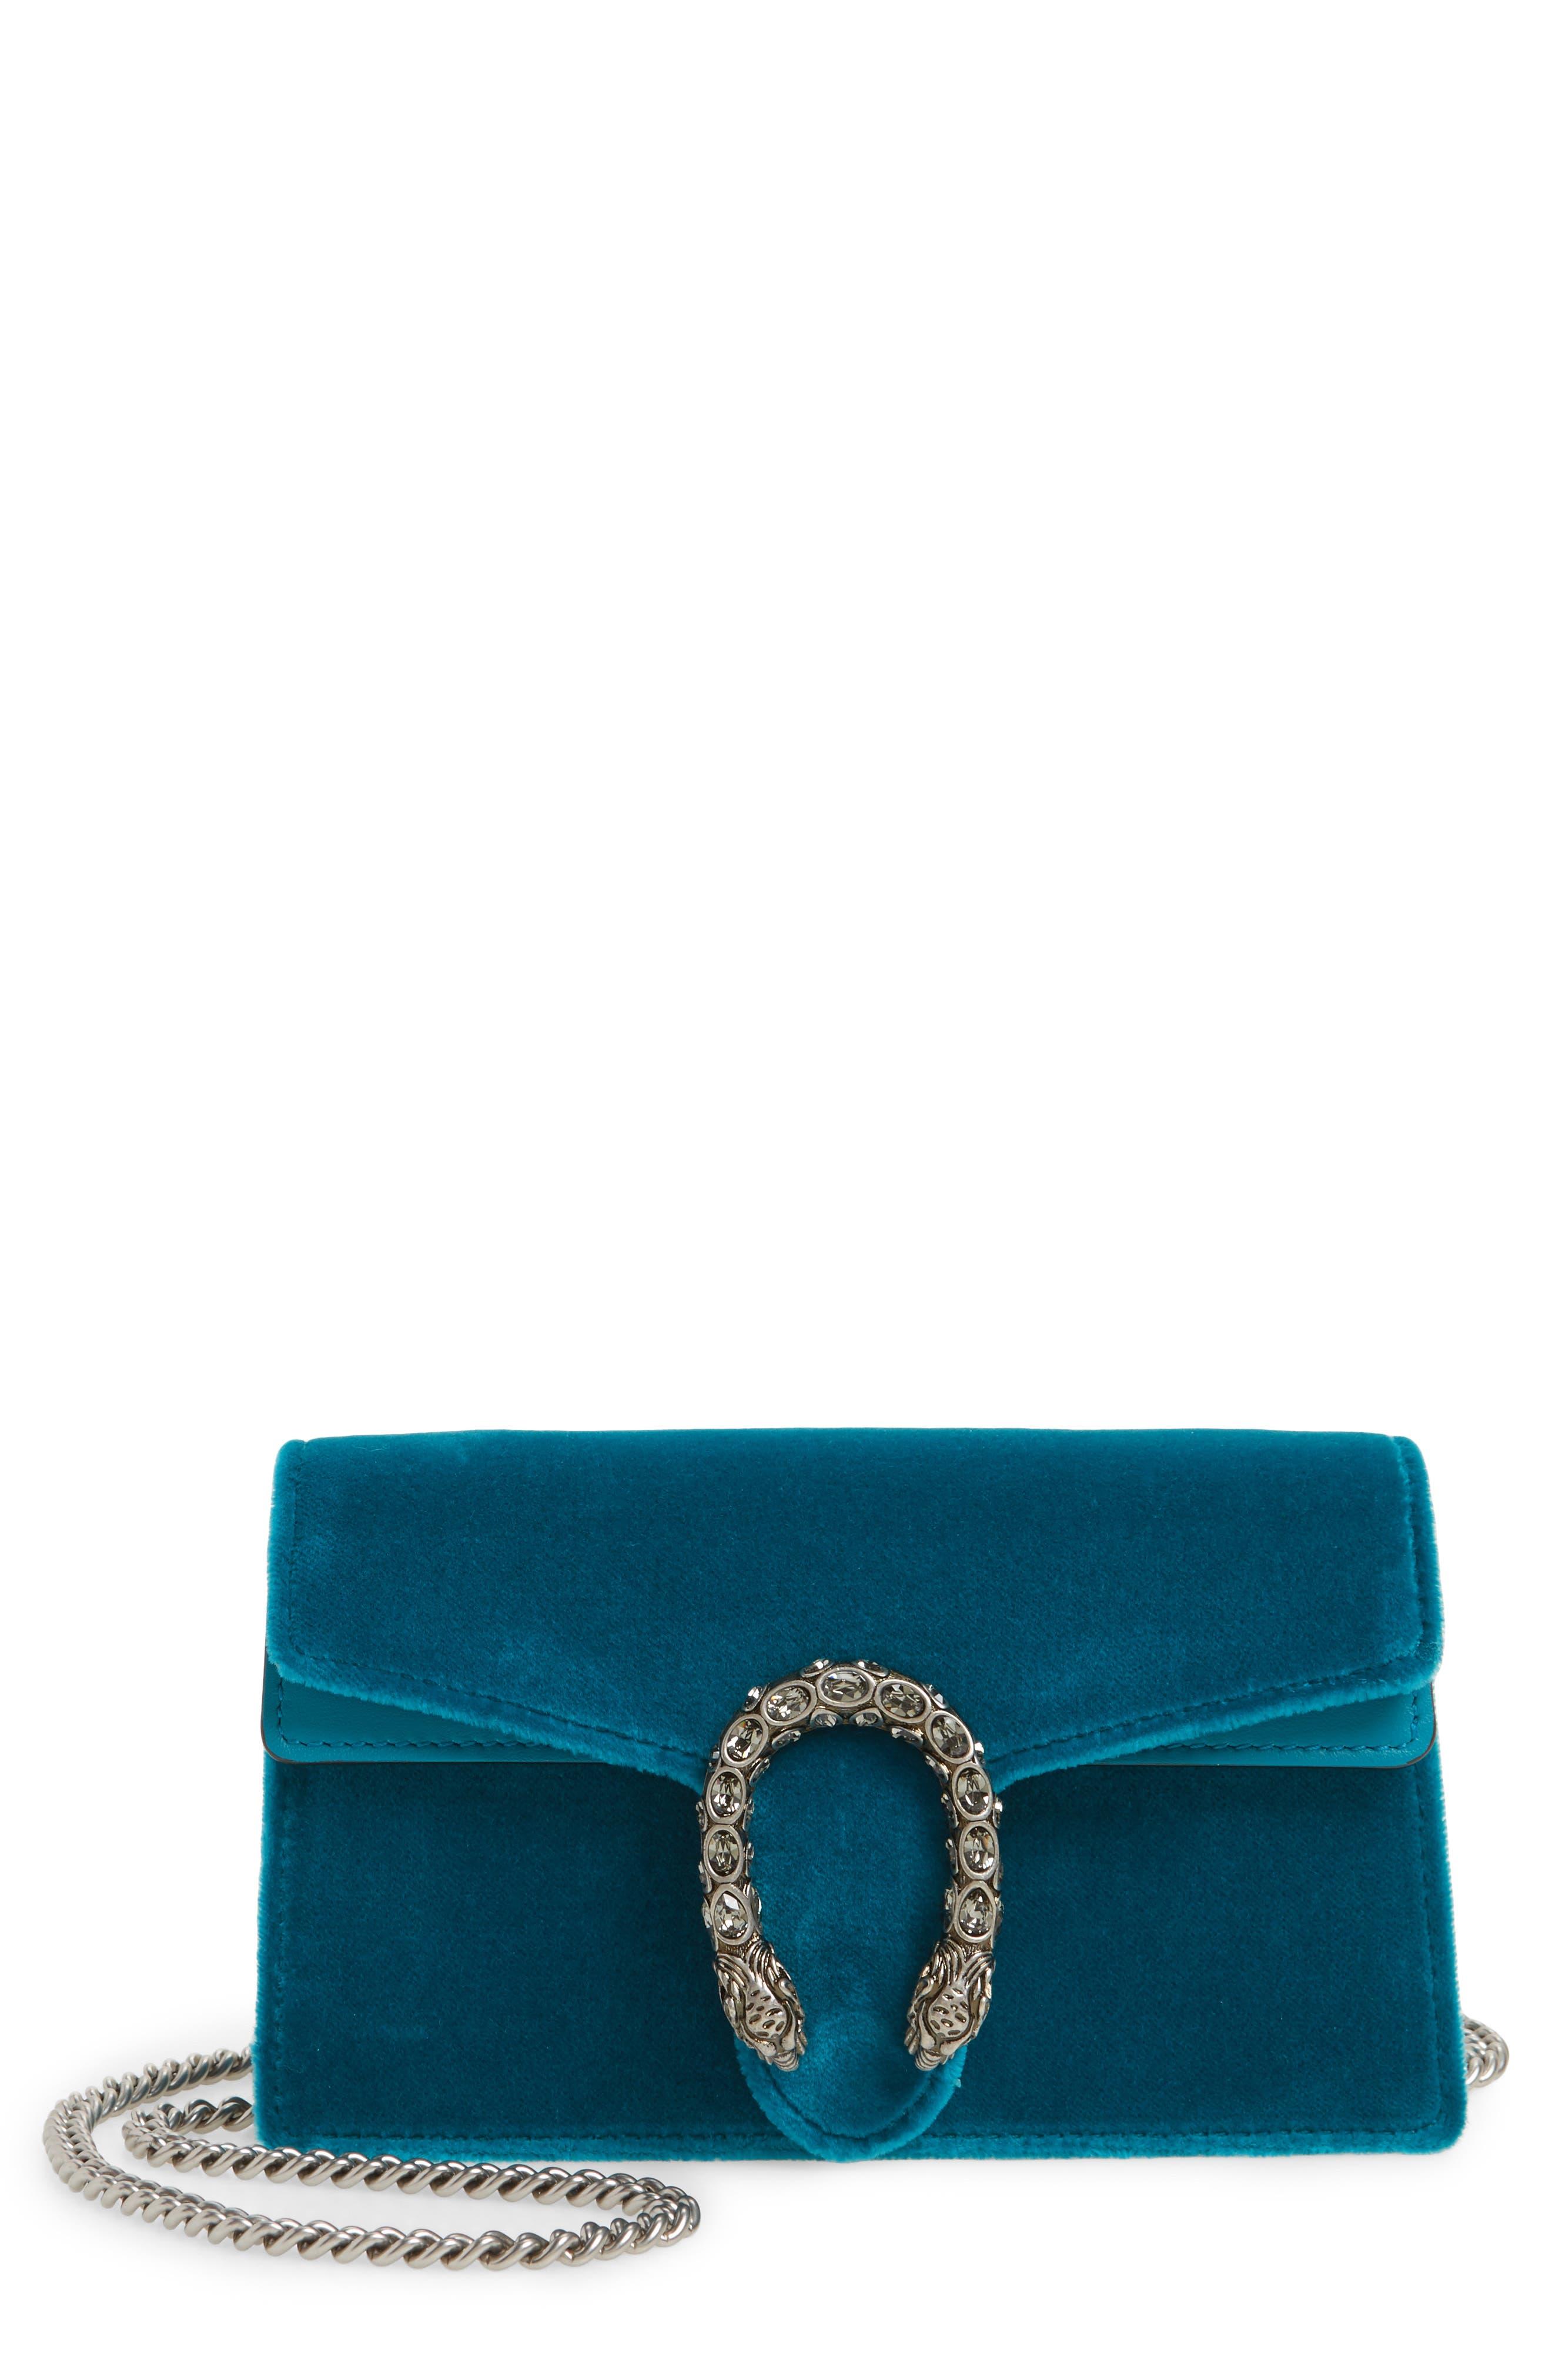 Super Mini Dionysus Velvet Shoulder Bag,                             Main thumbnail 1, color,                             PIVONE